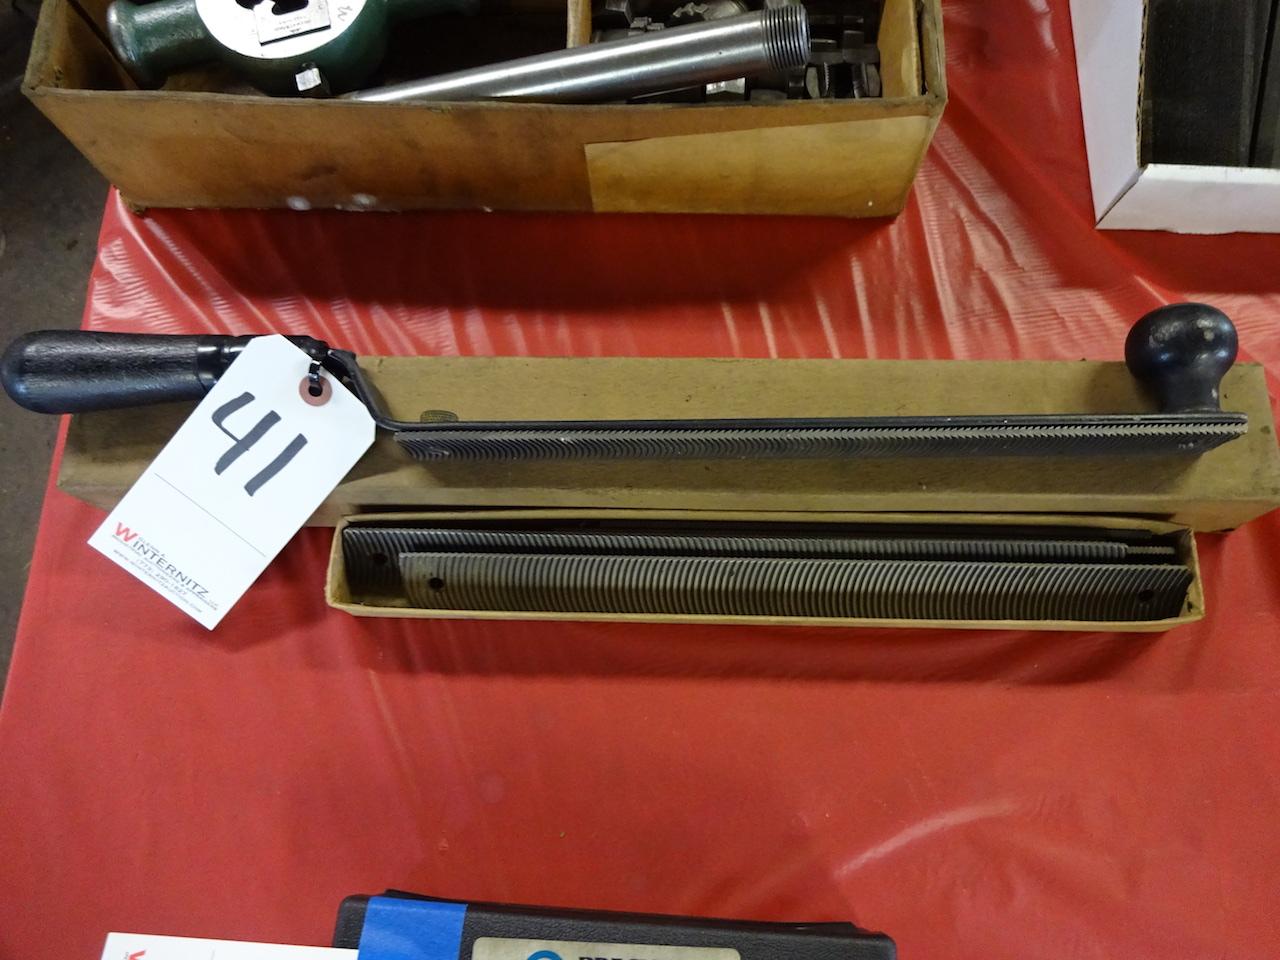 Lot 41 - LOT: Heller Brothers No. 416 File Holder with Flex Vixen Files